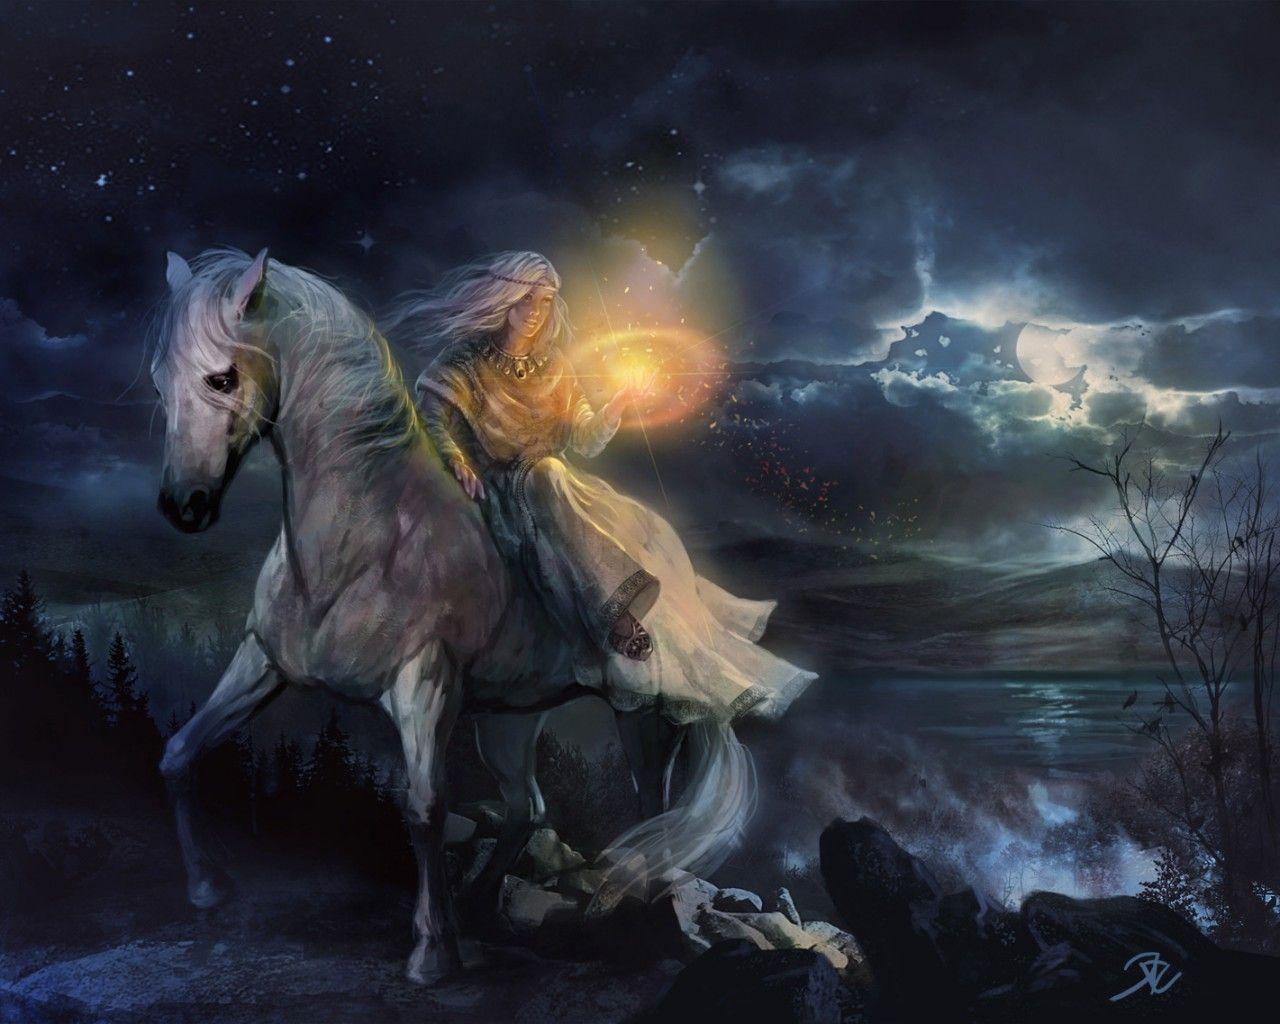 Best Wallpaper Horse Magic - 6dc16325b4800f68a108a96c0fe84459  Graphic_267178.jpg